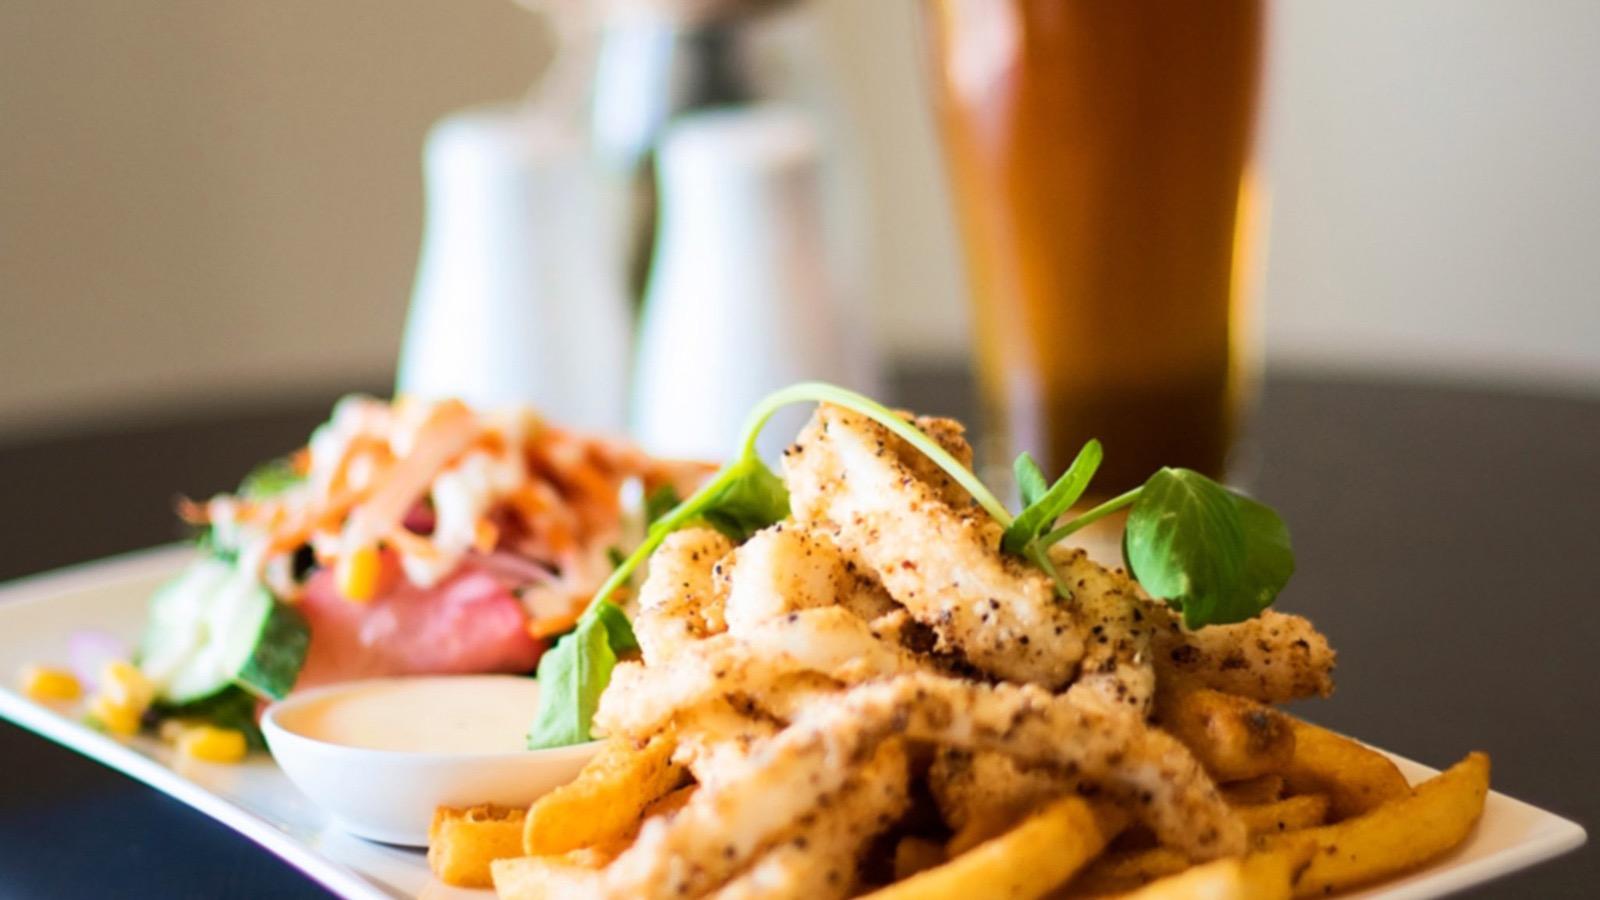 Queenscliff Brewhouse - Salt and Pepper Calamari